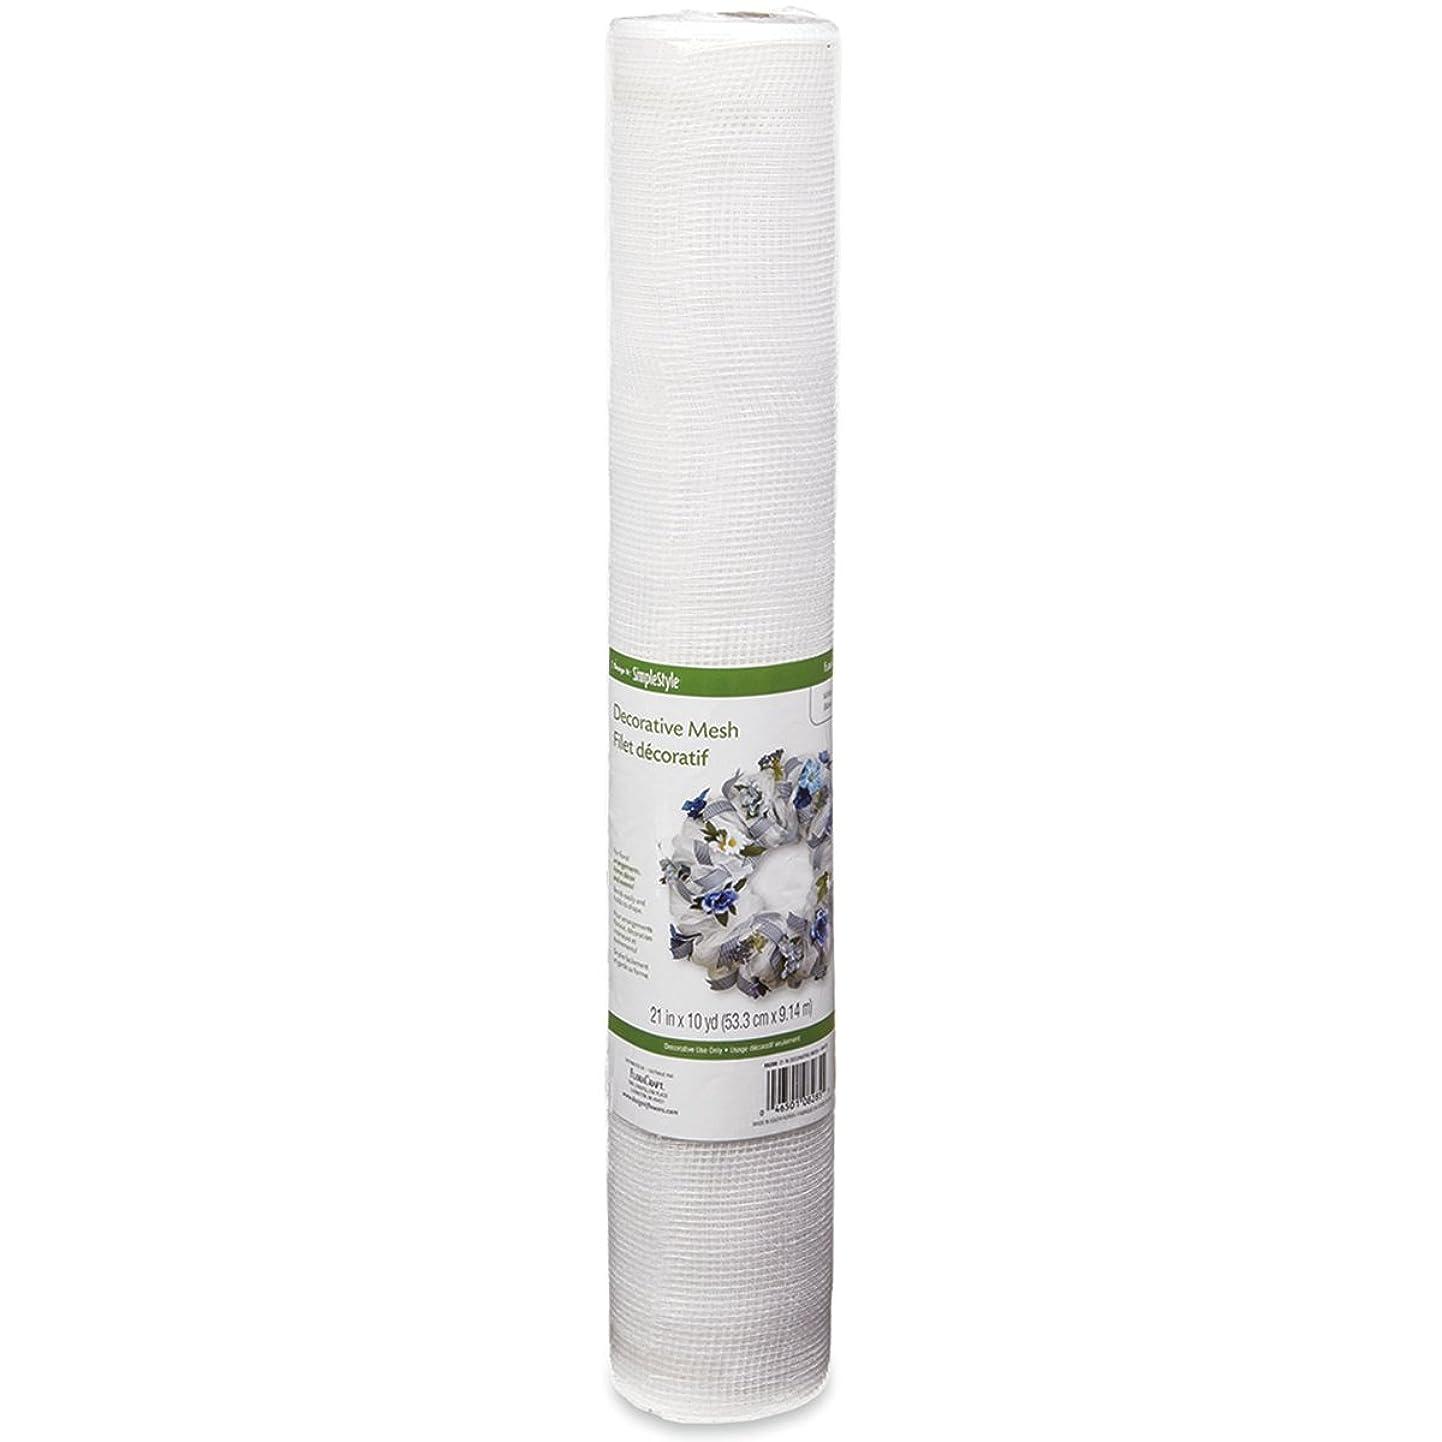 FloraCraft Decorative Mesh, 21-Inch by 10-Yard Length, White qjprqtcincp9